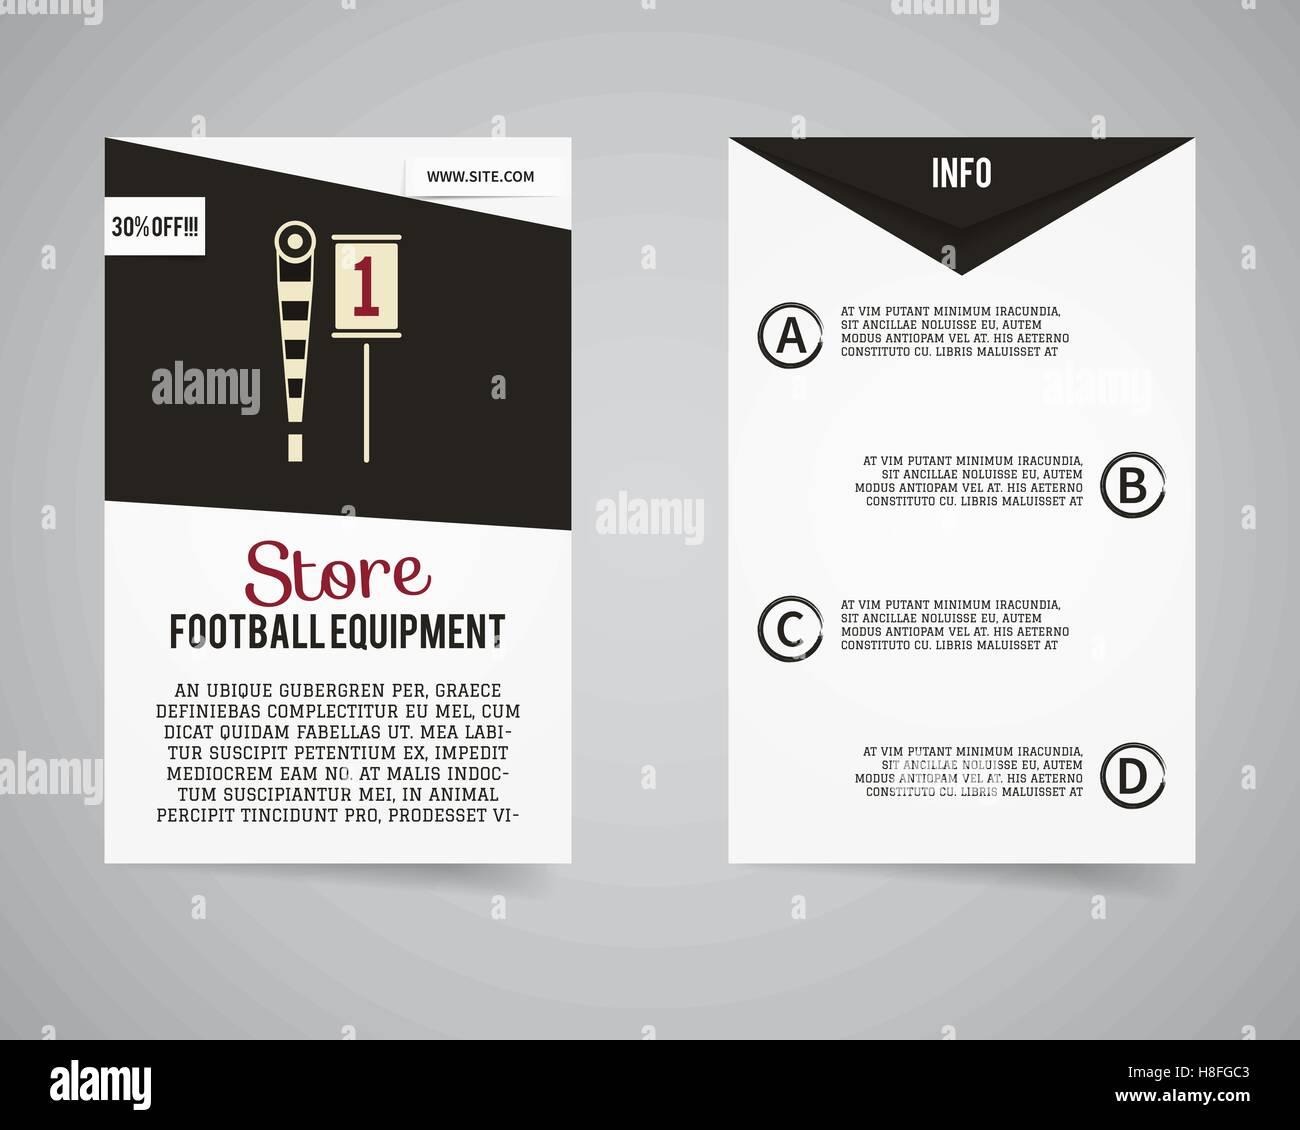 american football equipment store shop flyer template design usa